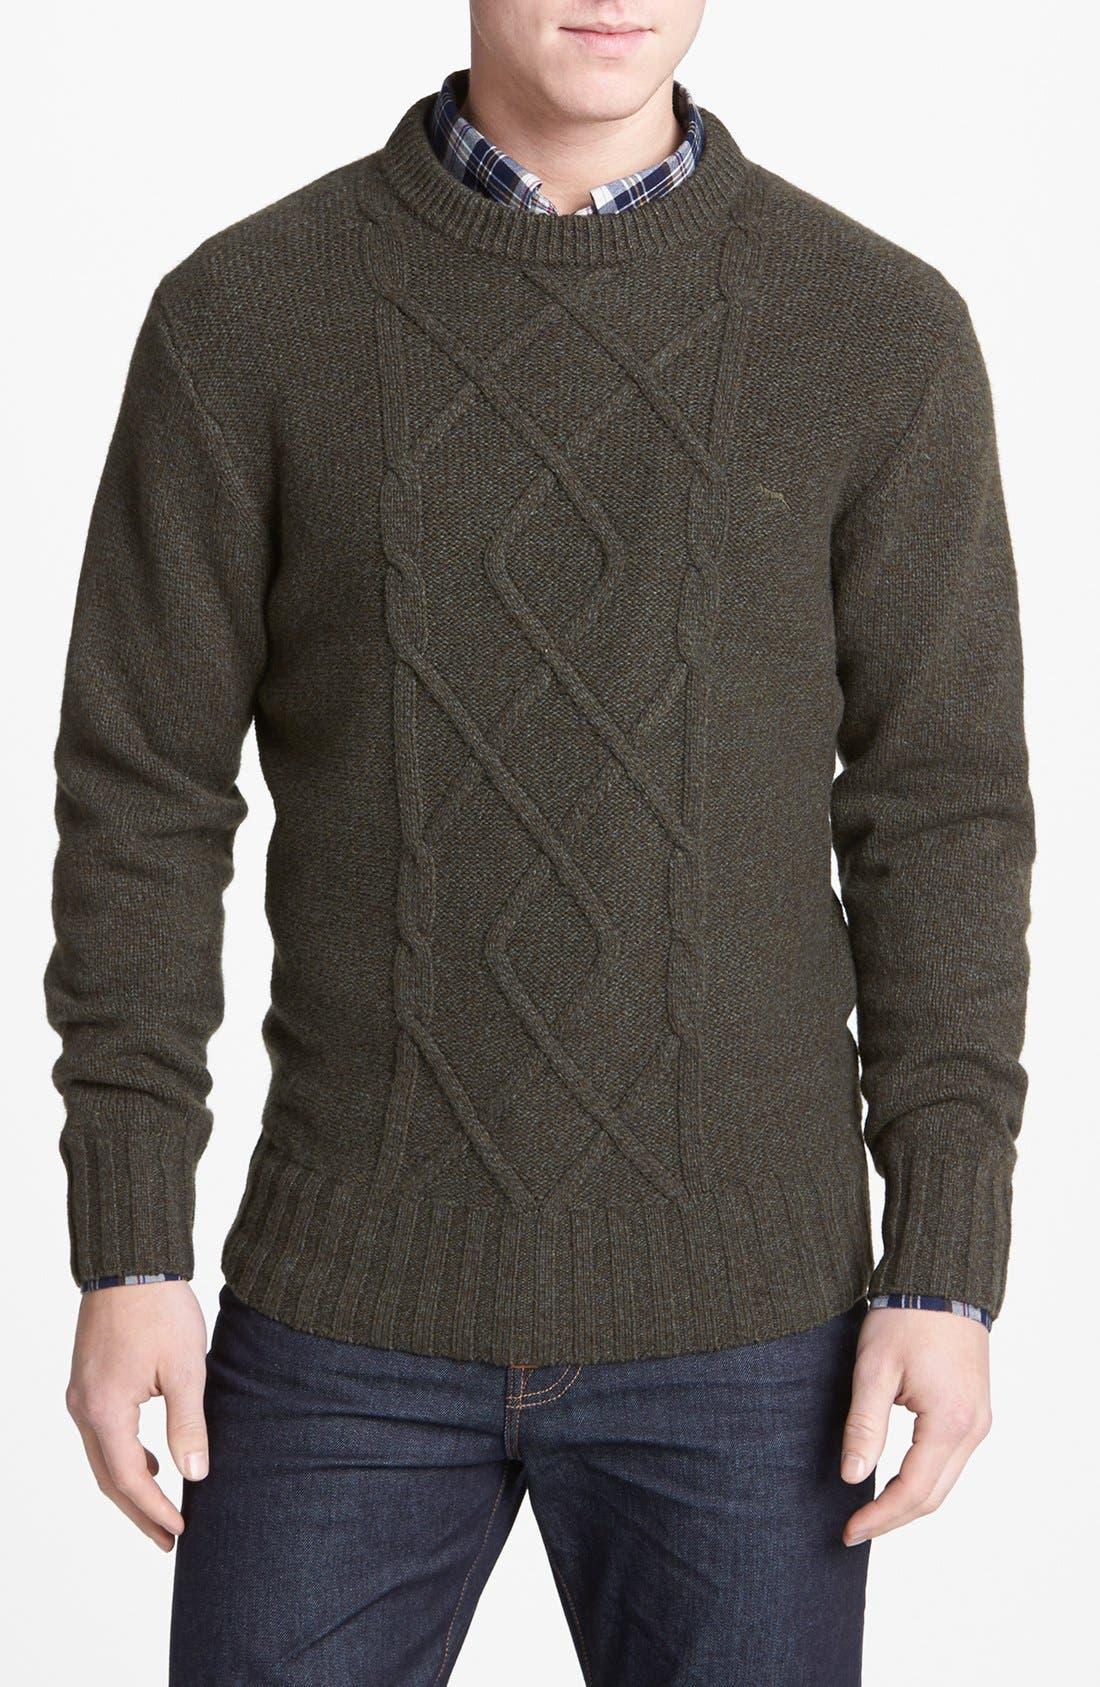 Main Image - Rodd & Gunn 'Sumer' Cable Knit Sweater